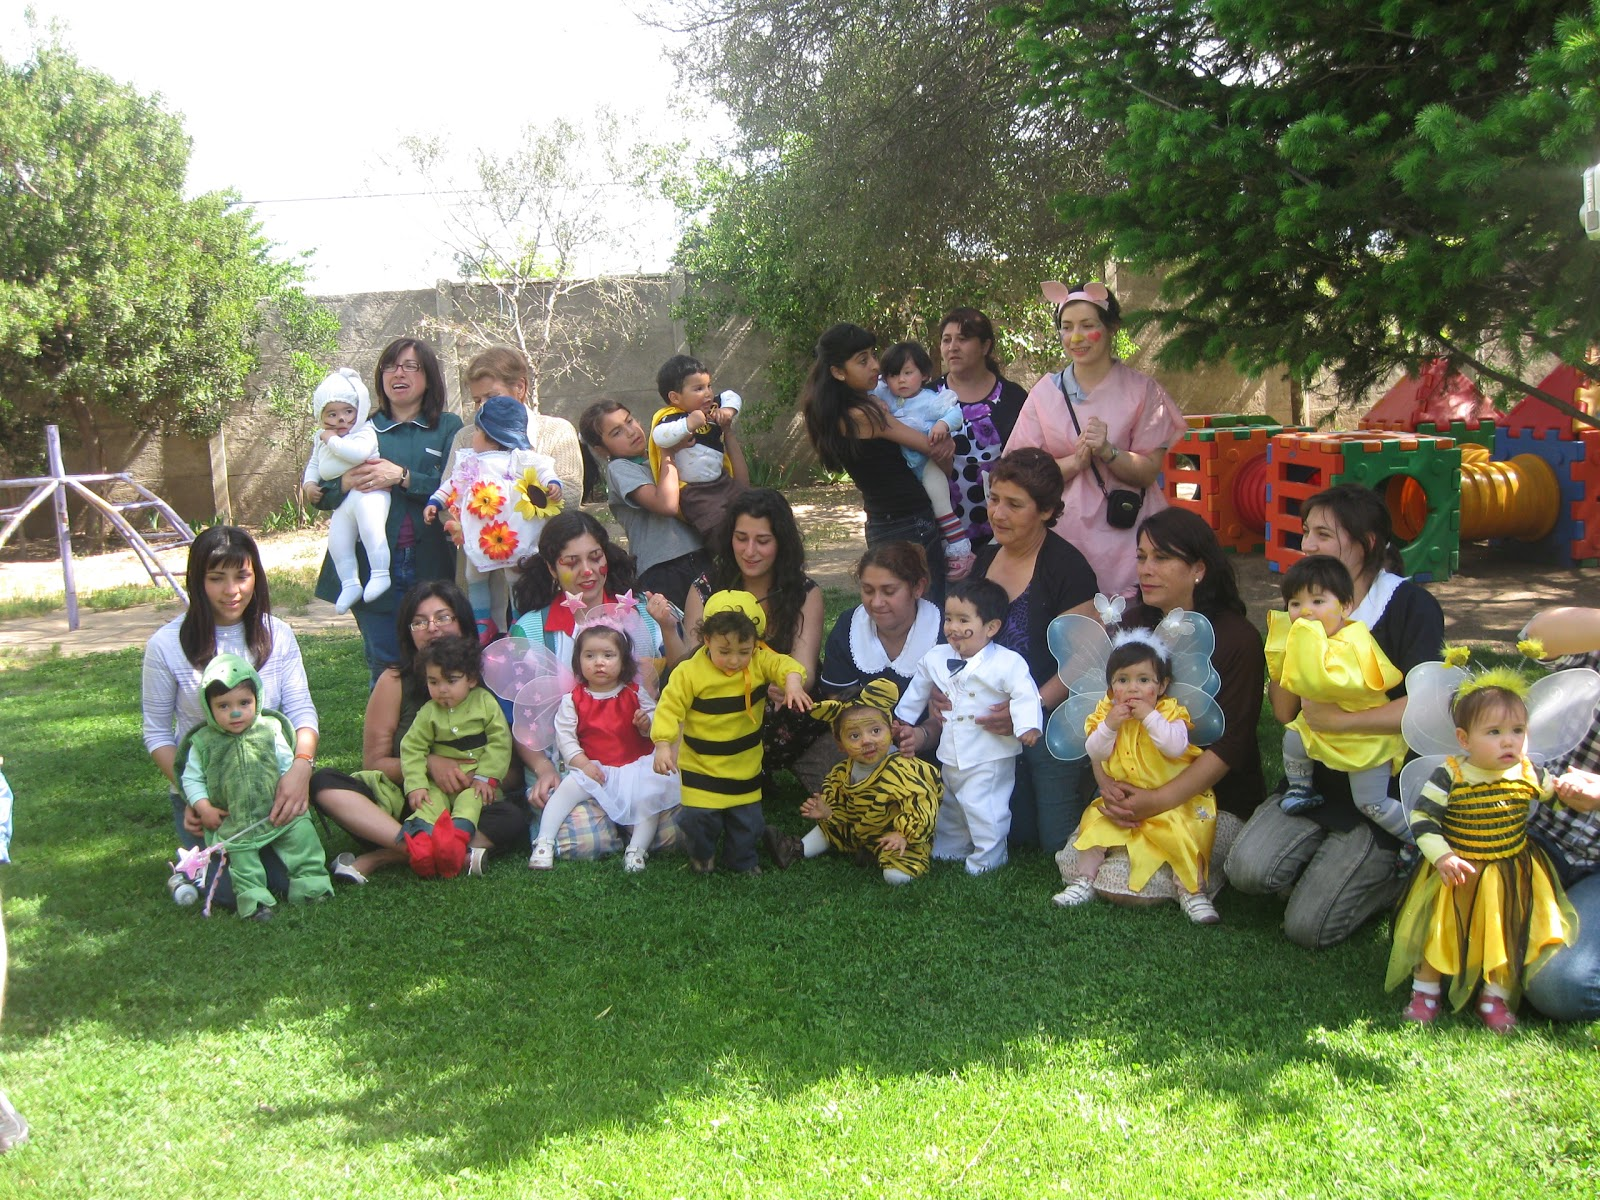 Jardin infantil los grillitos rancagua desfile de disfraces for Jardin infantil